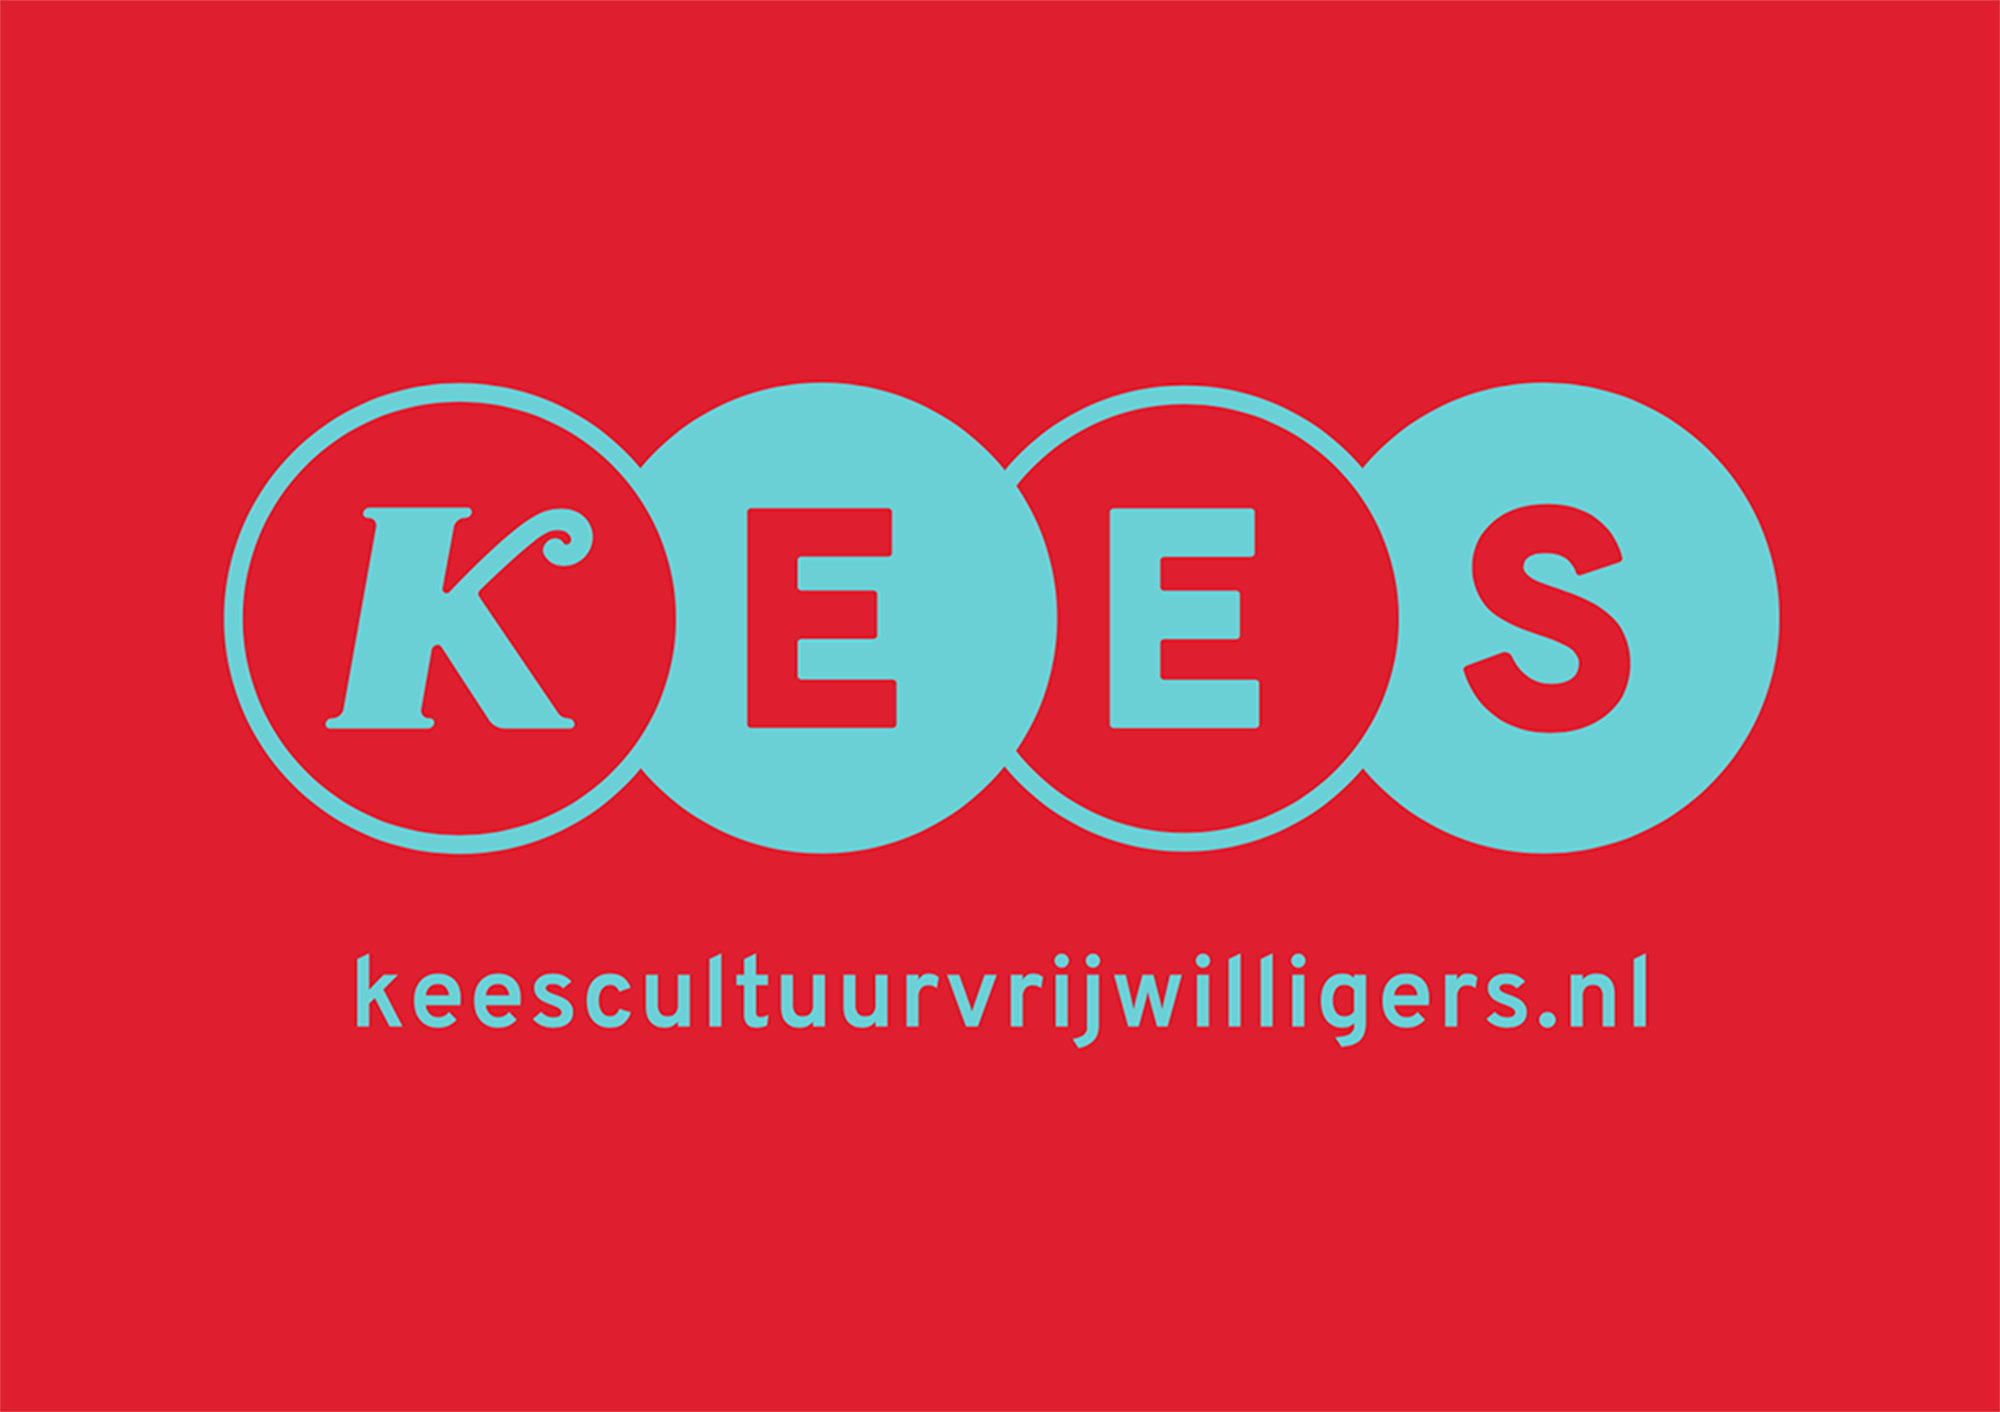 Wervingsposters KEES in opdracht van cultuurvrijwilligersorganisatie KEES